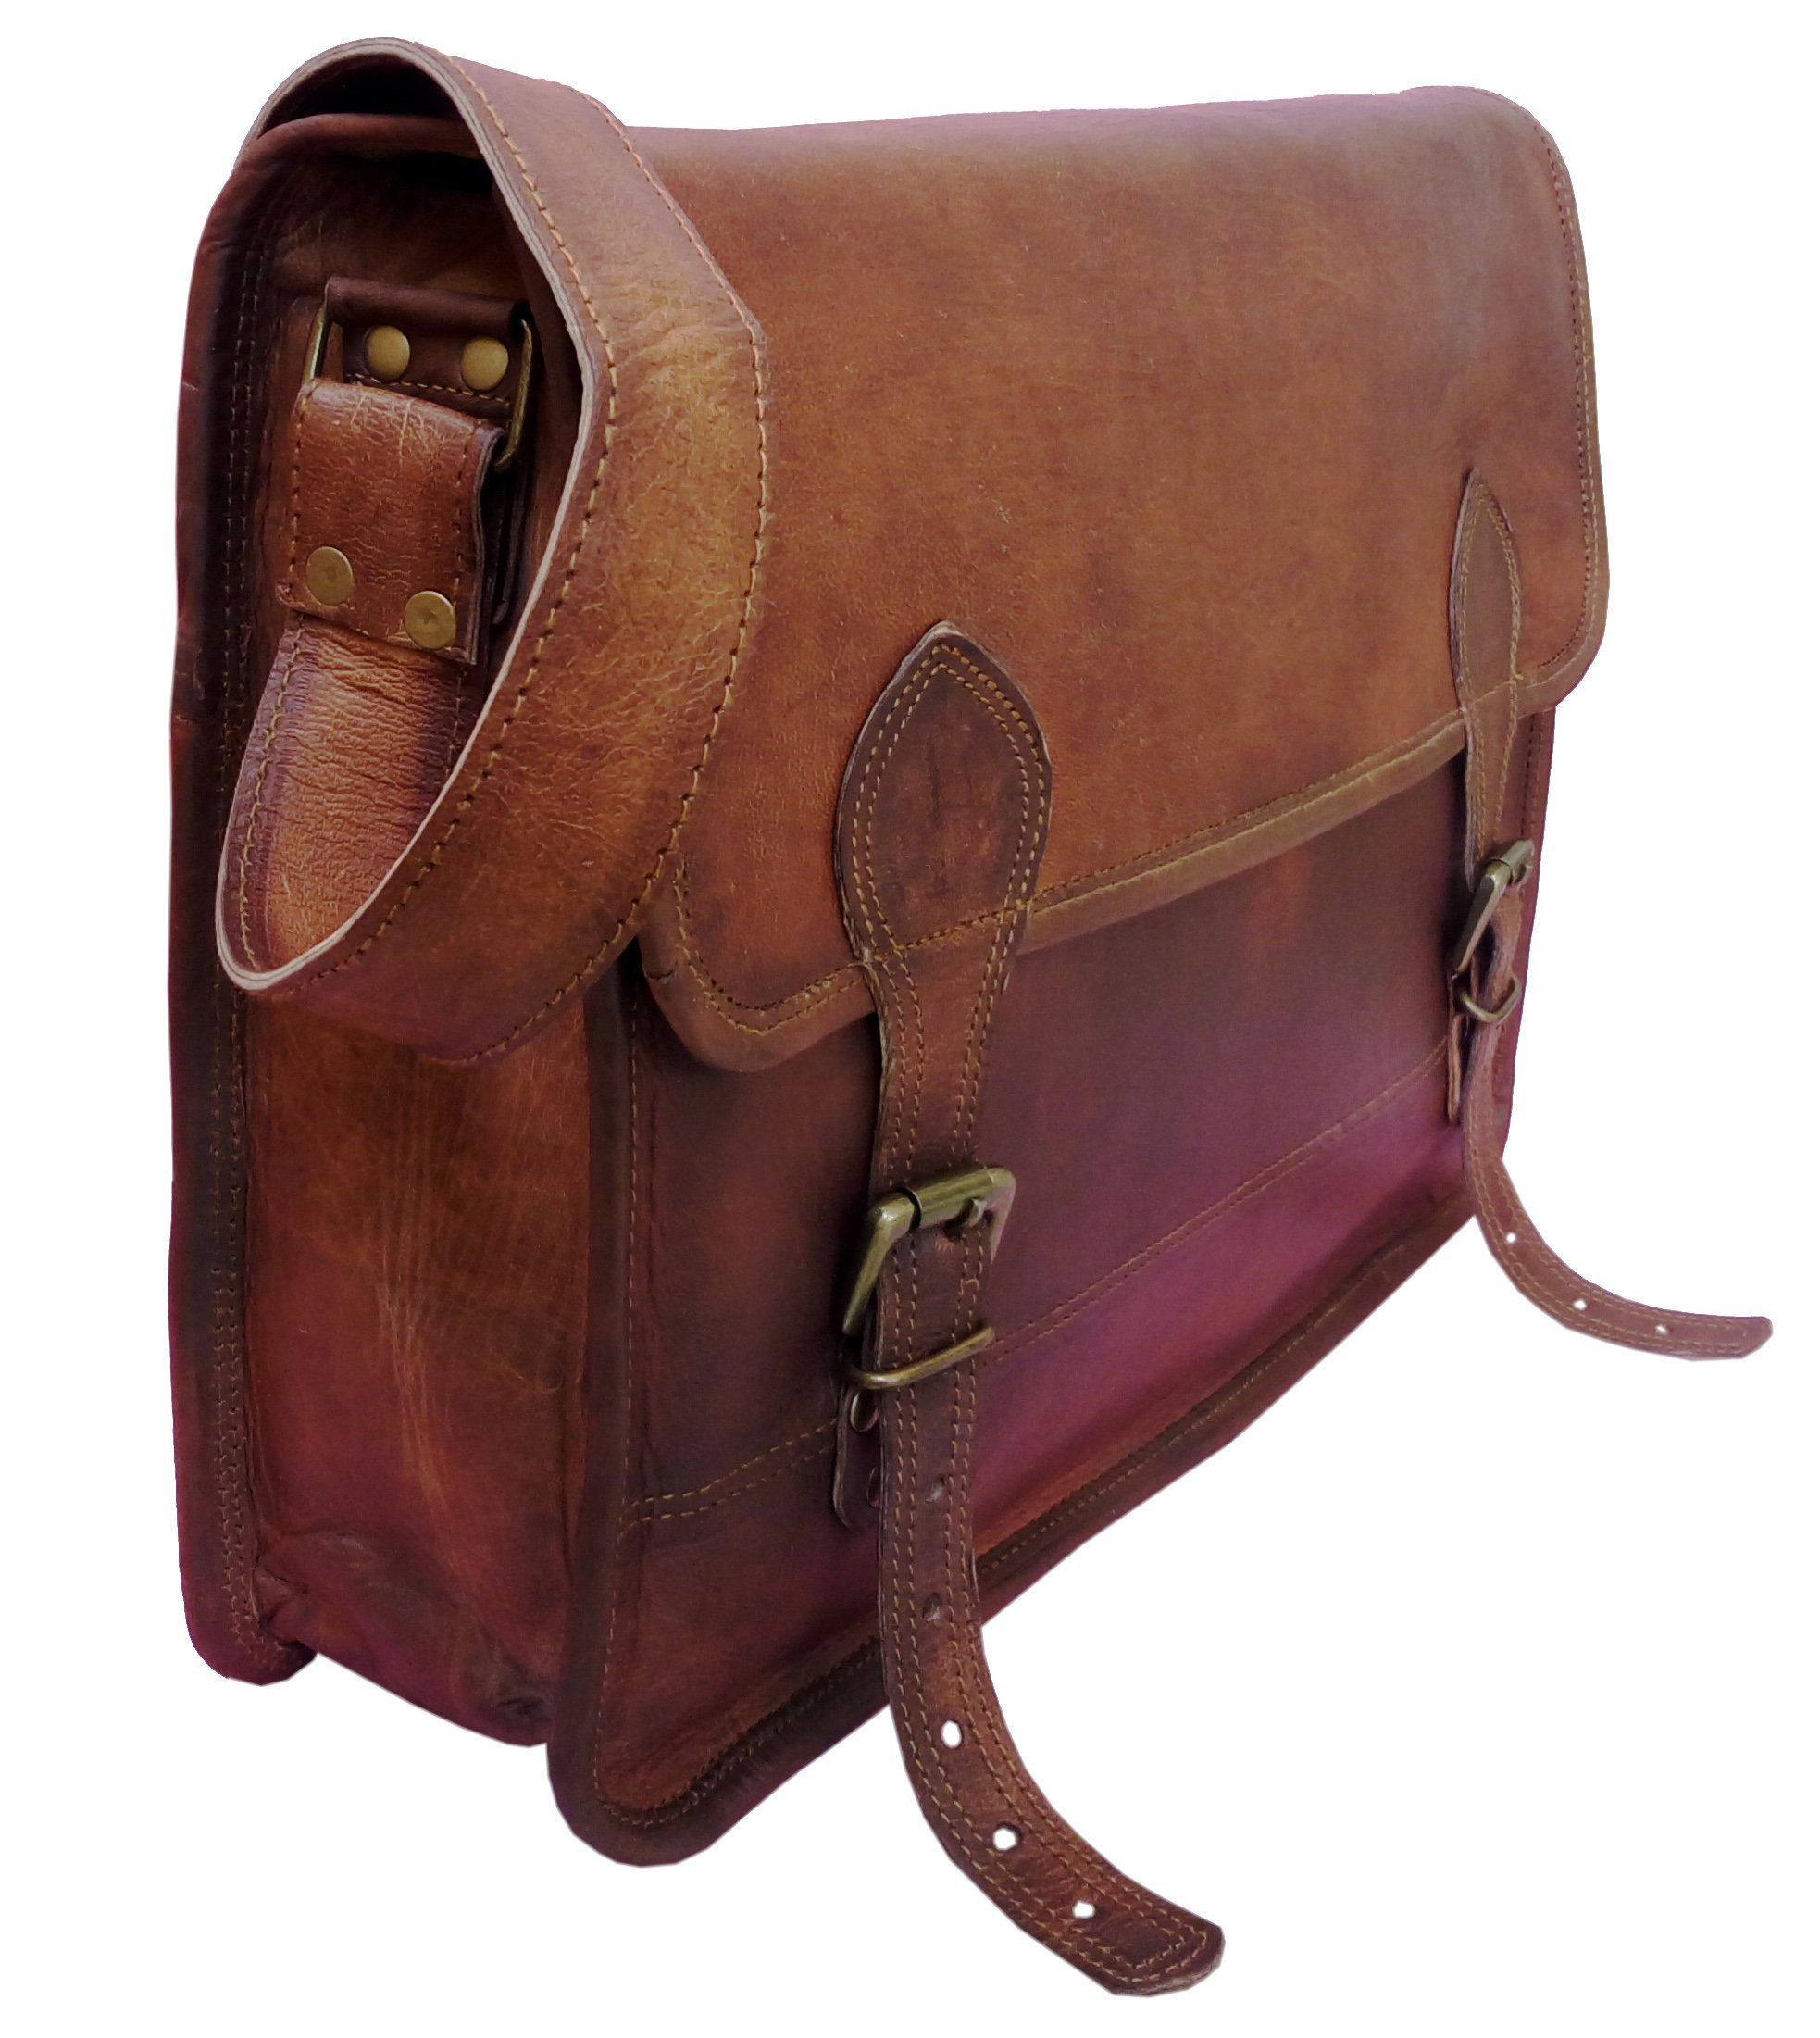 Handolederco Leather Unisex Real Leather Messenger Bag for Laptop Briefcase Satchel ...